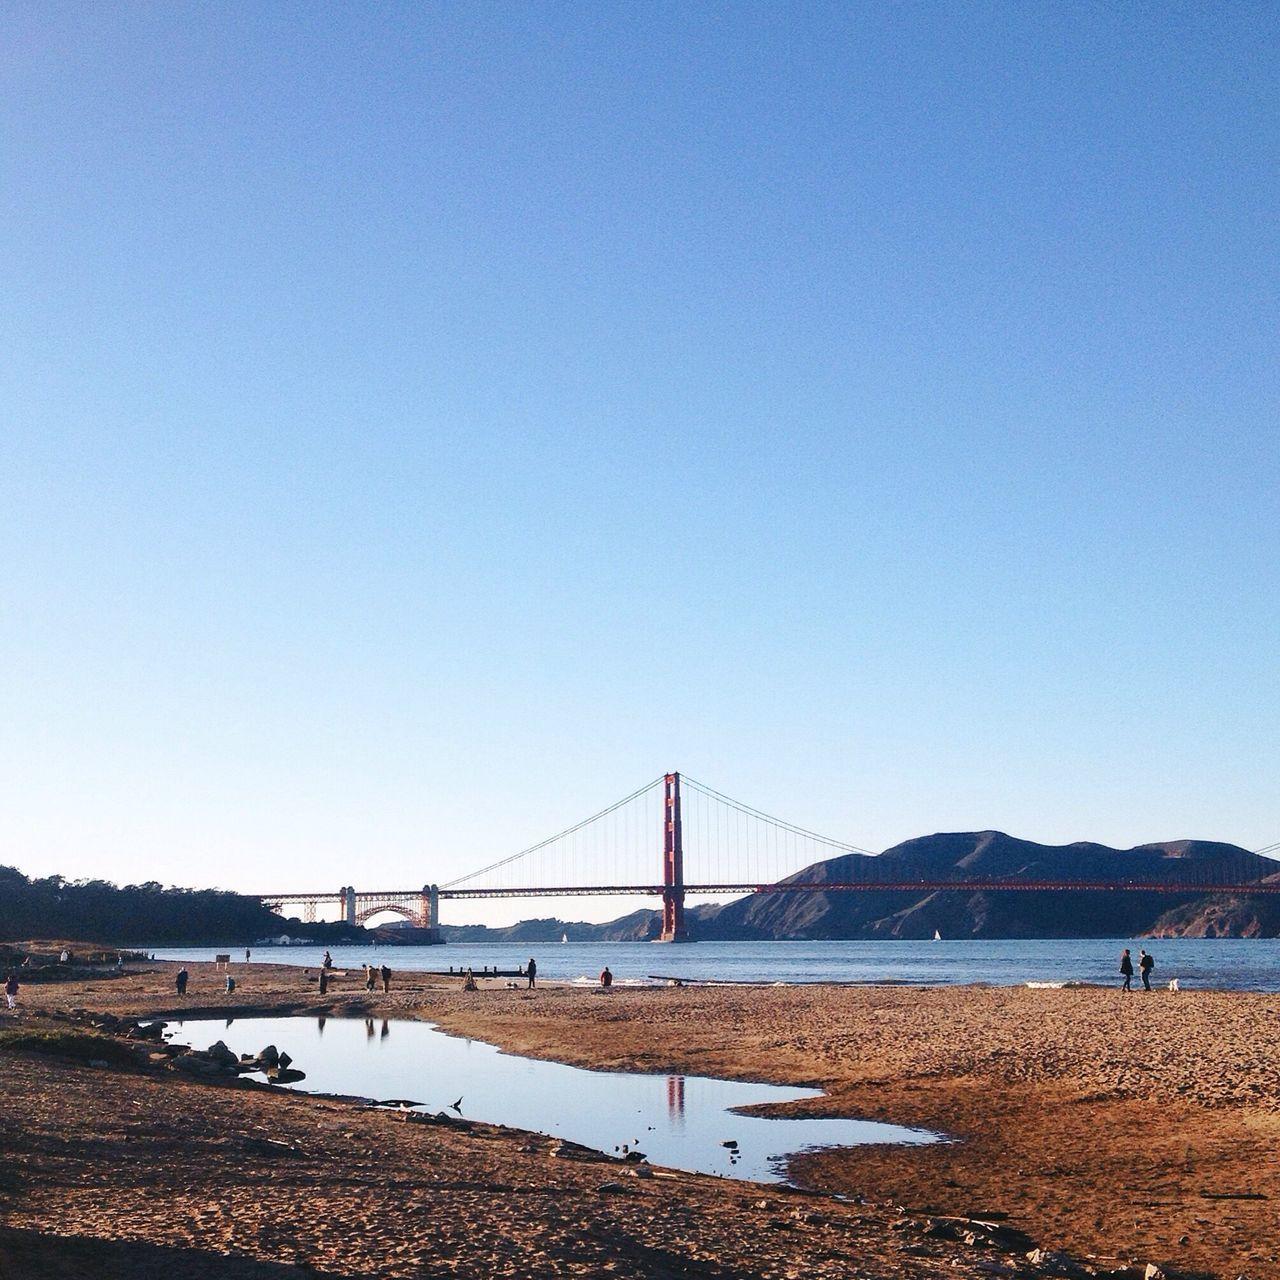 The golden gate San Francisco Golden Gate Bridge